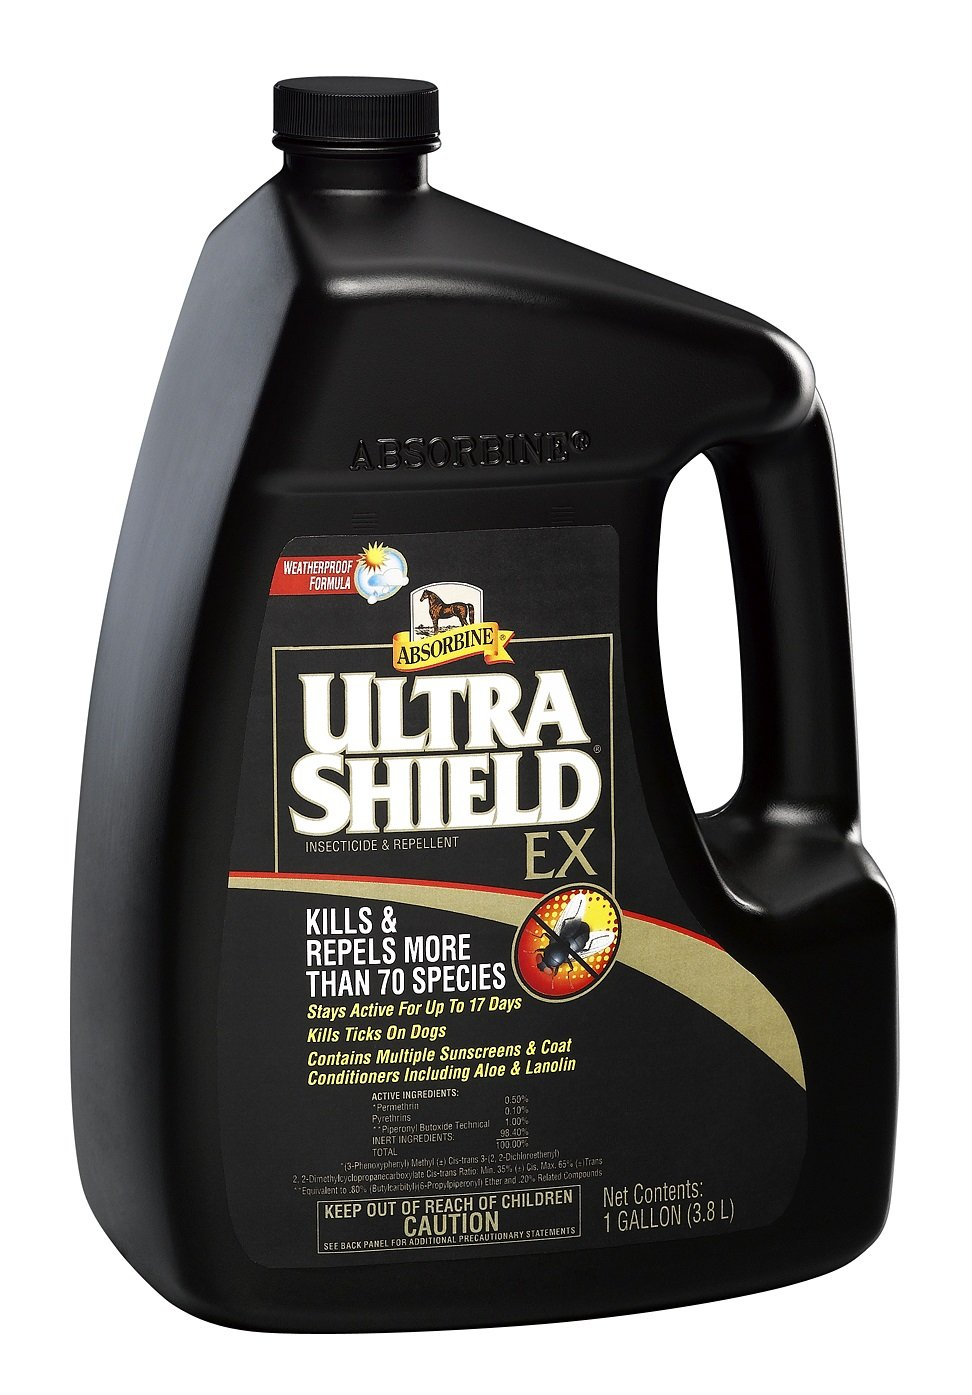 Absorbine 1 Gallon Ultra Shield EX Kills and Repels More Than 70 Species ! Weatherproof Formula